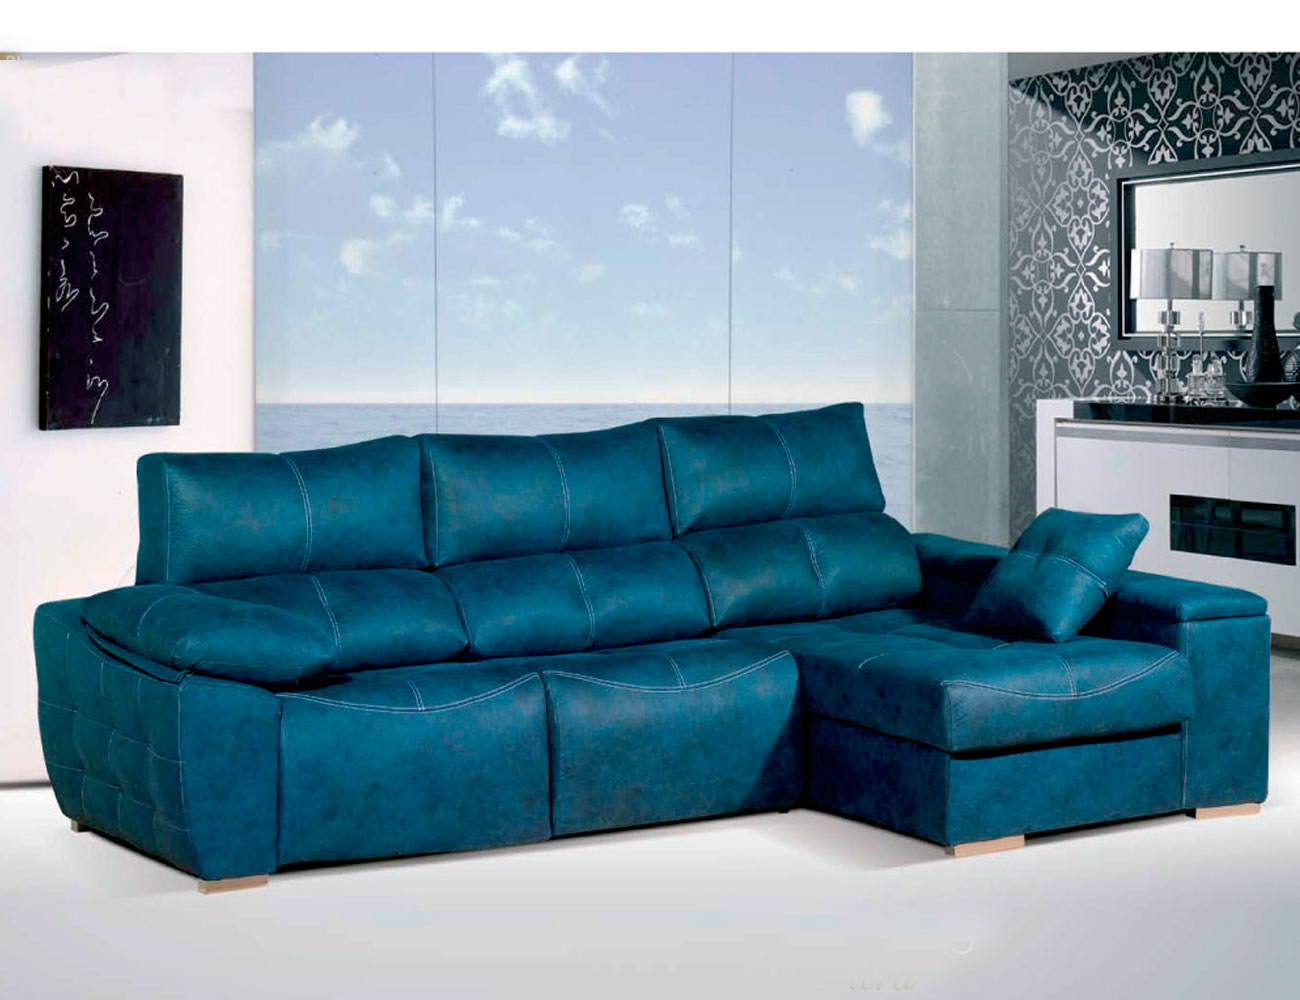 Sofa chaiselongue relax 2 motores anti manchas turquesa3